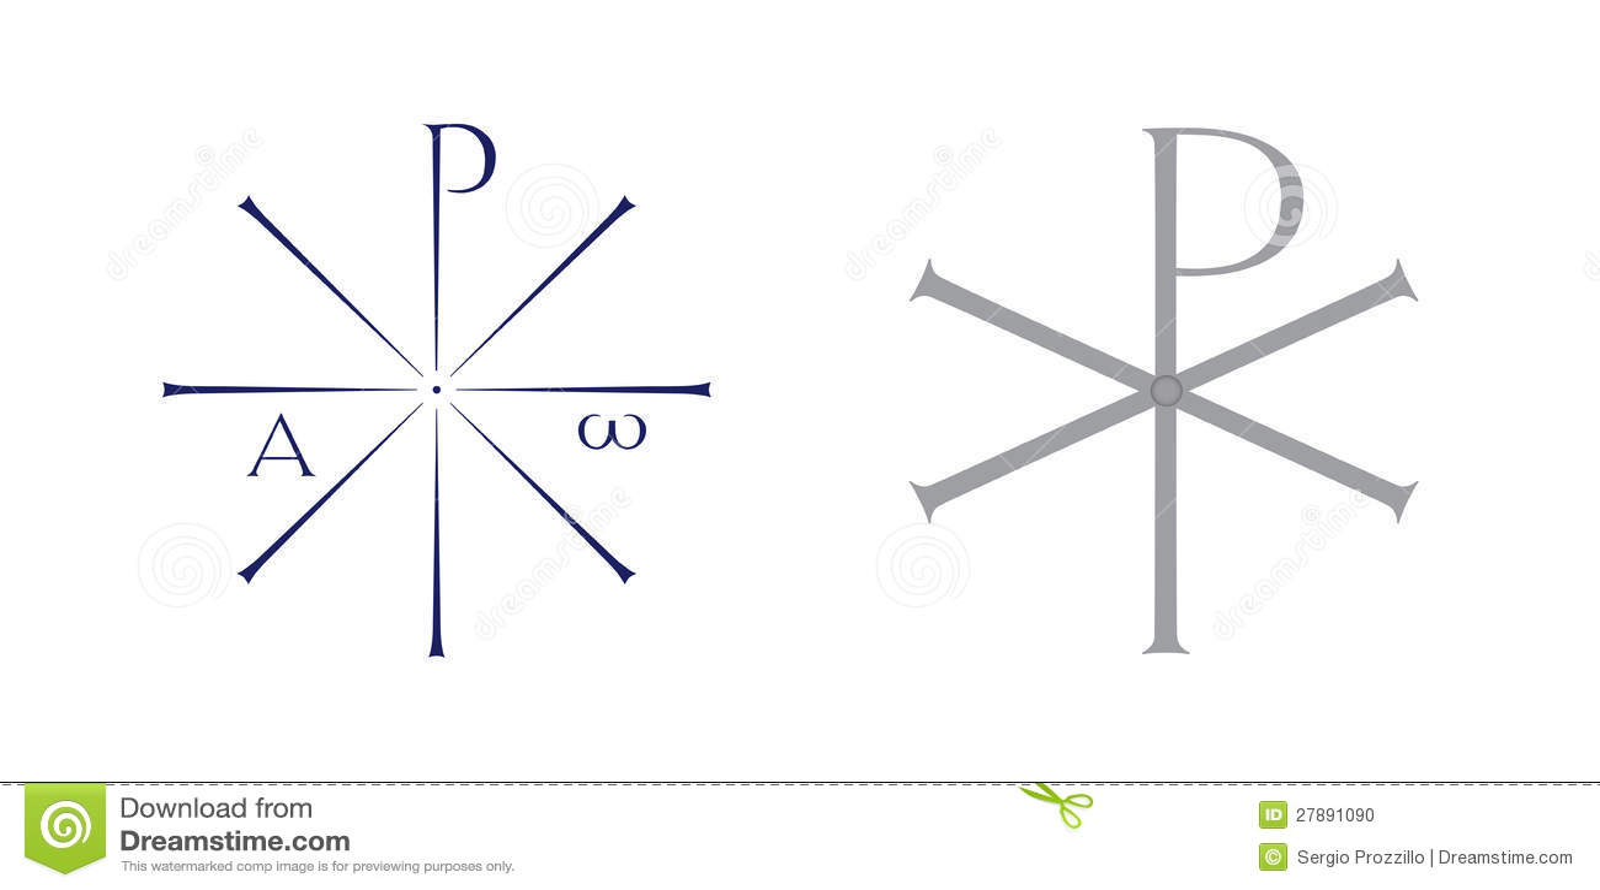 Monogram of christ symbol stock illustration illustration of monogram of christ symbol biocorpaavc